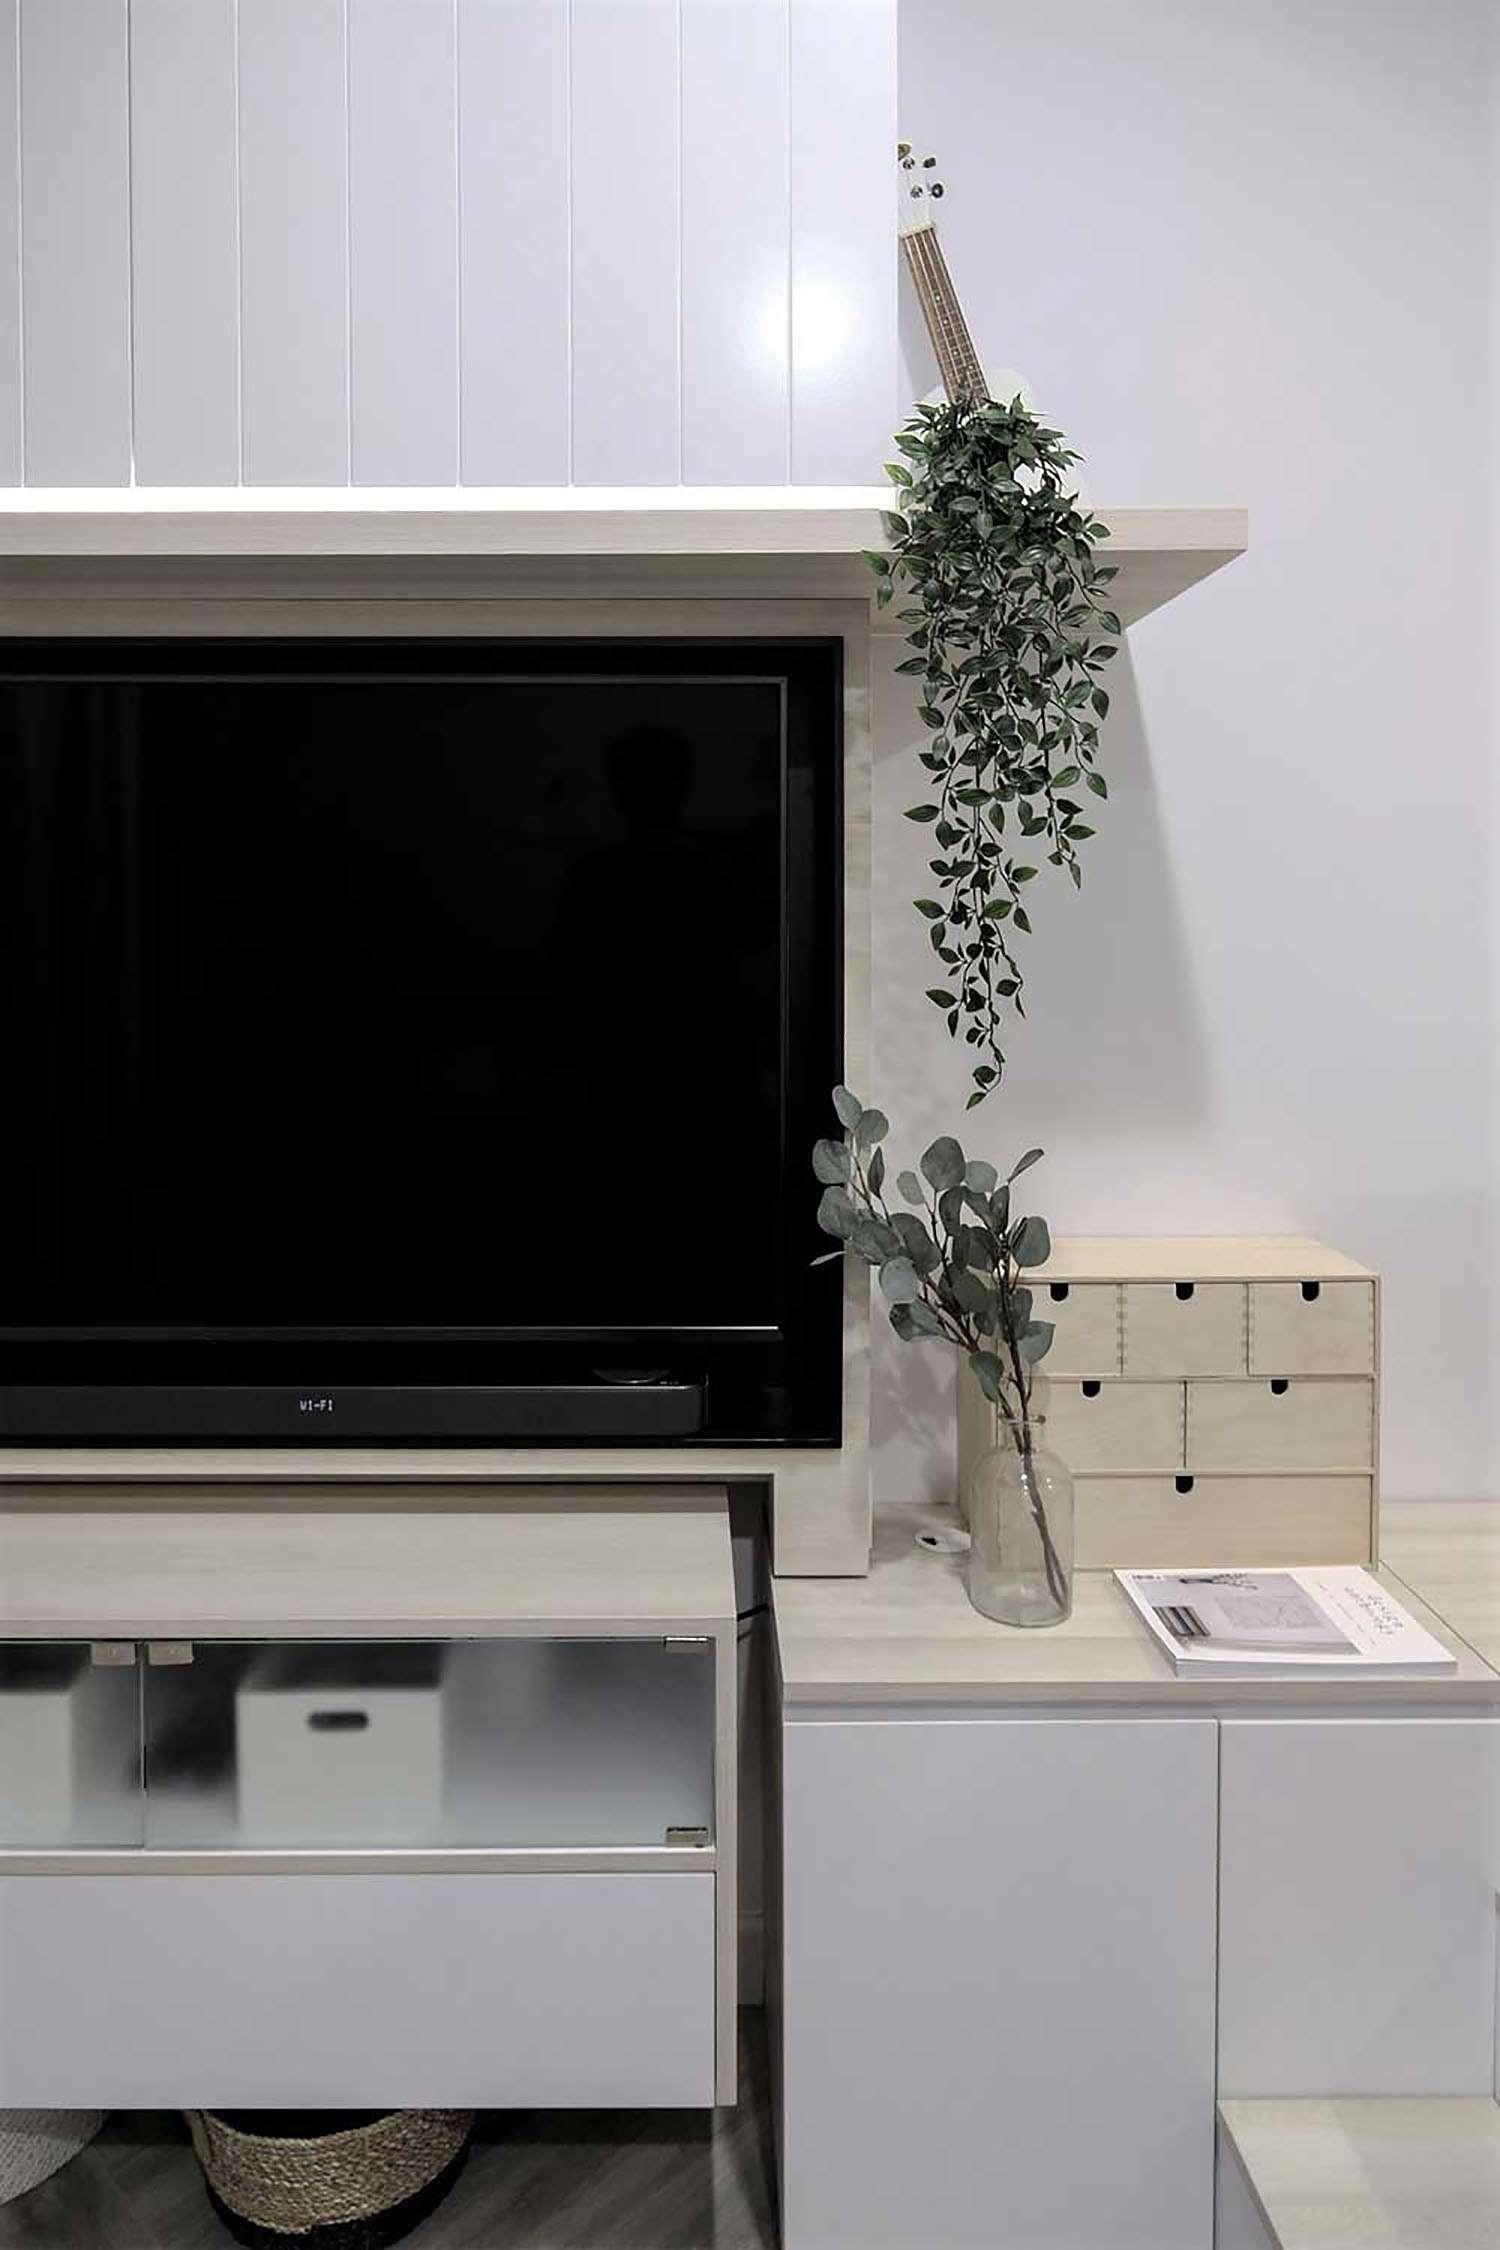 Quiet Apartment Co+in Collaborative Lab tv no table